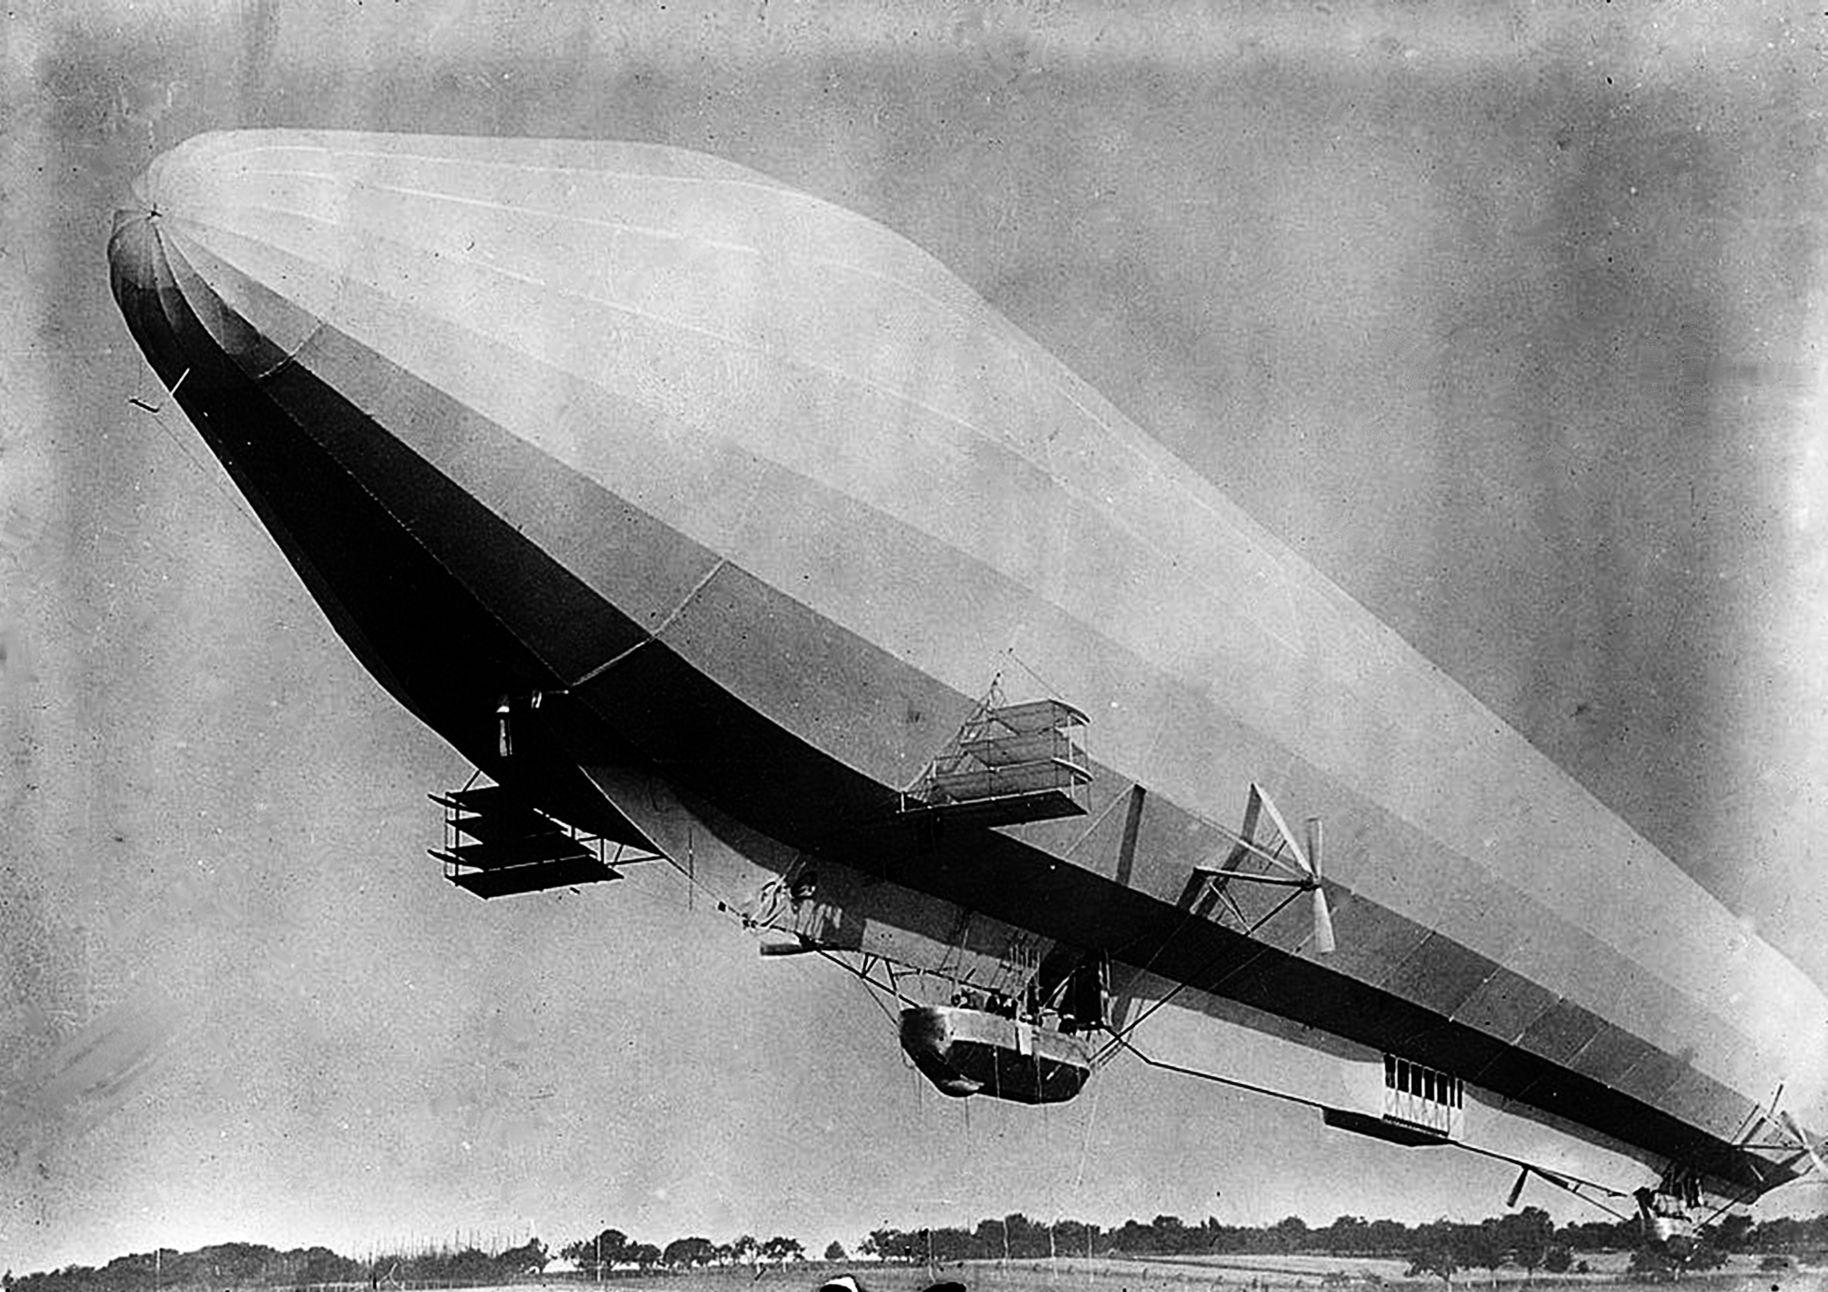 LZ7_passenger_zeppelin_mod last